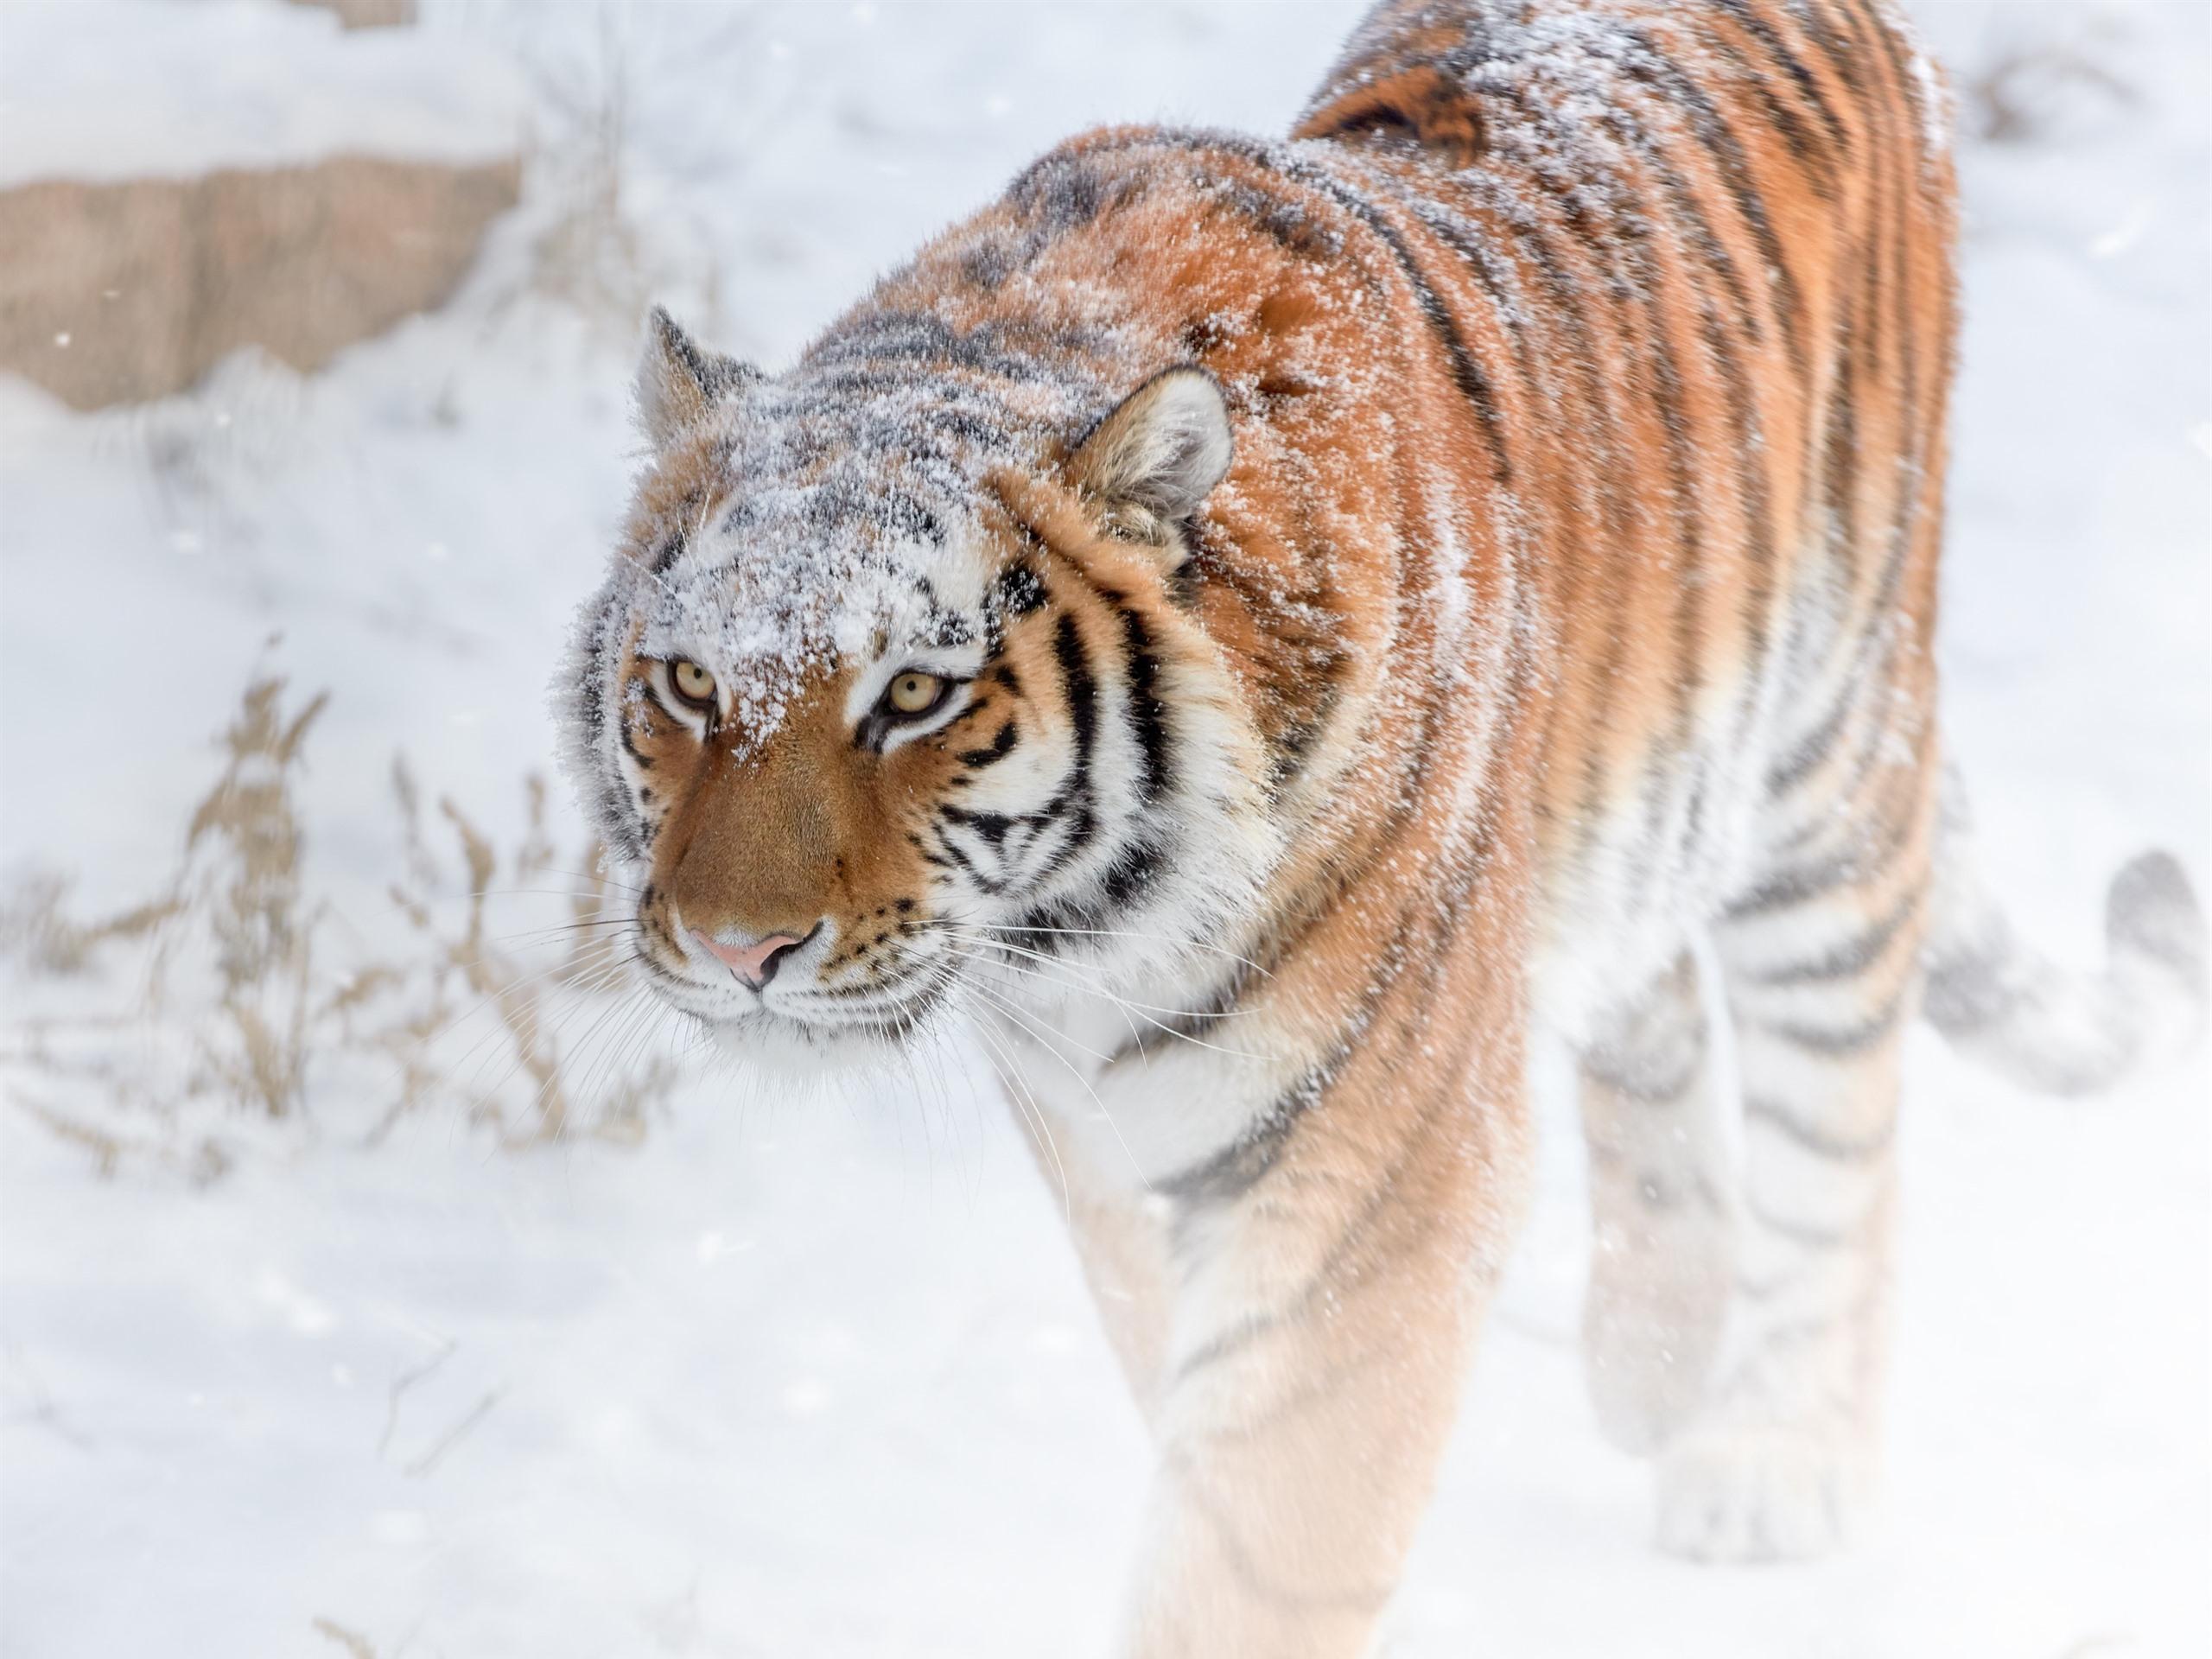 картинка тигр и снег зеленая палитра